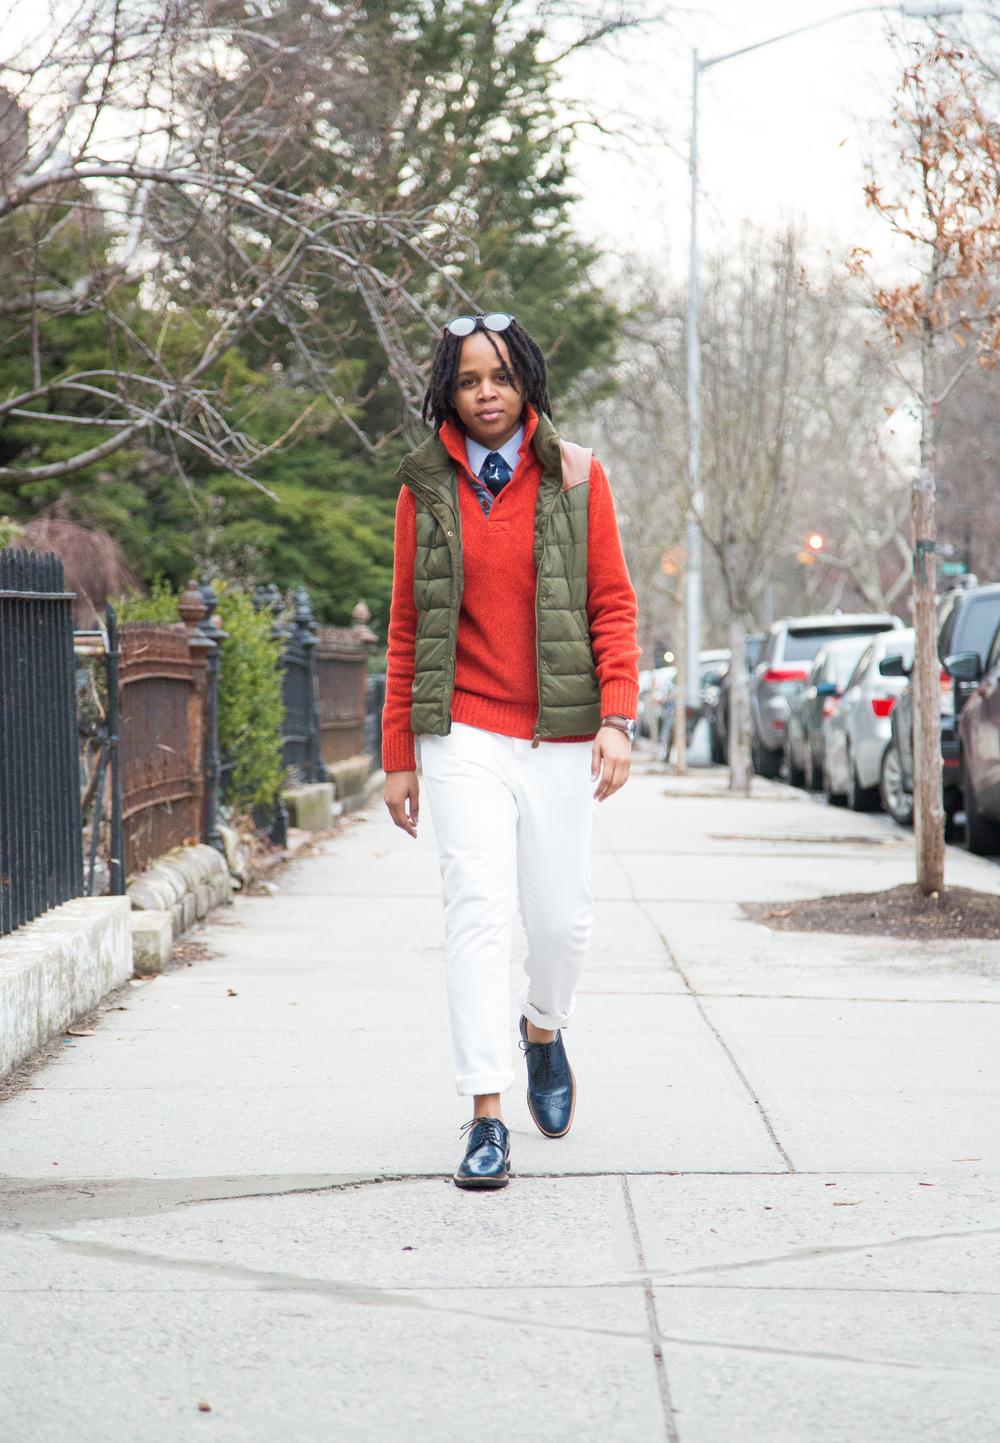 Sara_Brooklyn-7.jpg